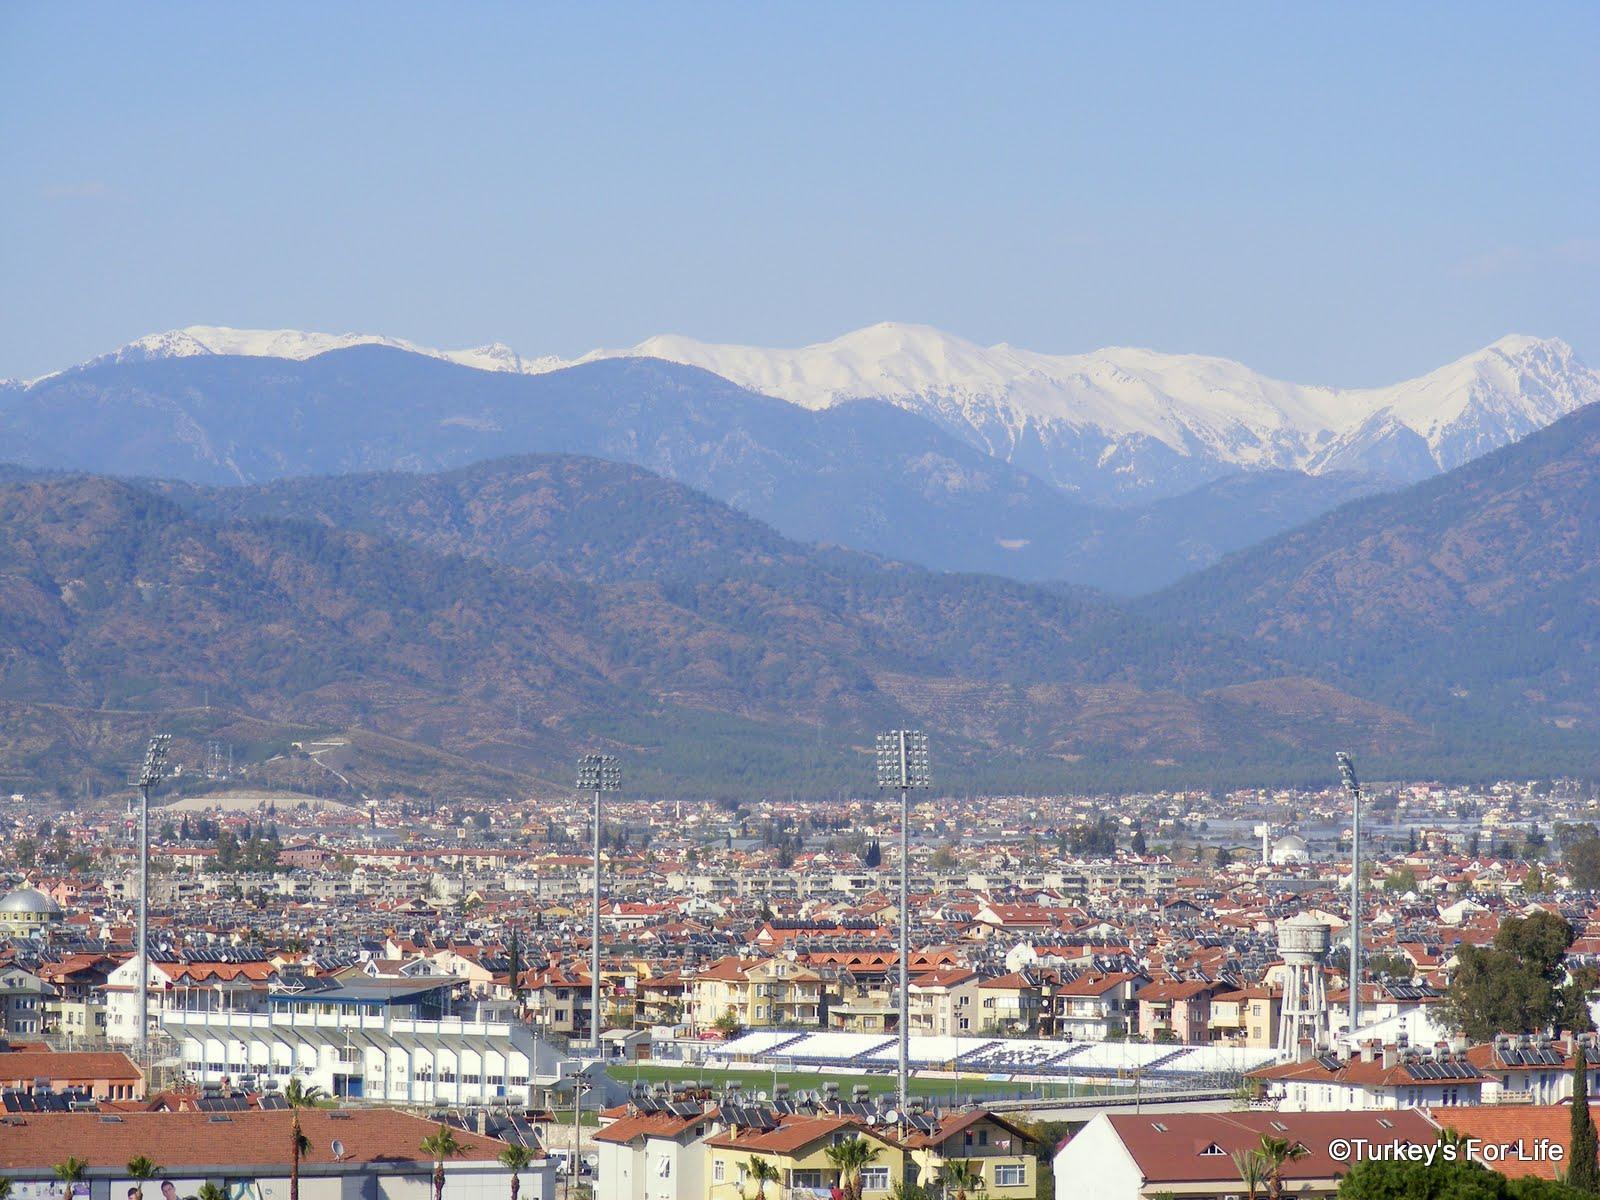 http://1.bp.blogspot.com/-AQ5WW9Iw9O4/T27F7SUXVDI/AAAAAAAAEGI/0AeSHZowU9s/s1600/Fethiye+Spor+Turkey+football+stadium.JPG